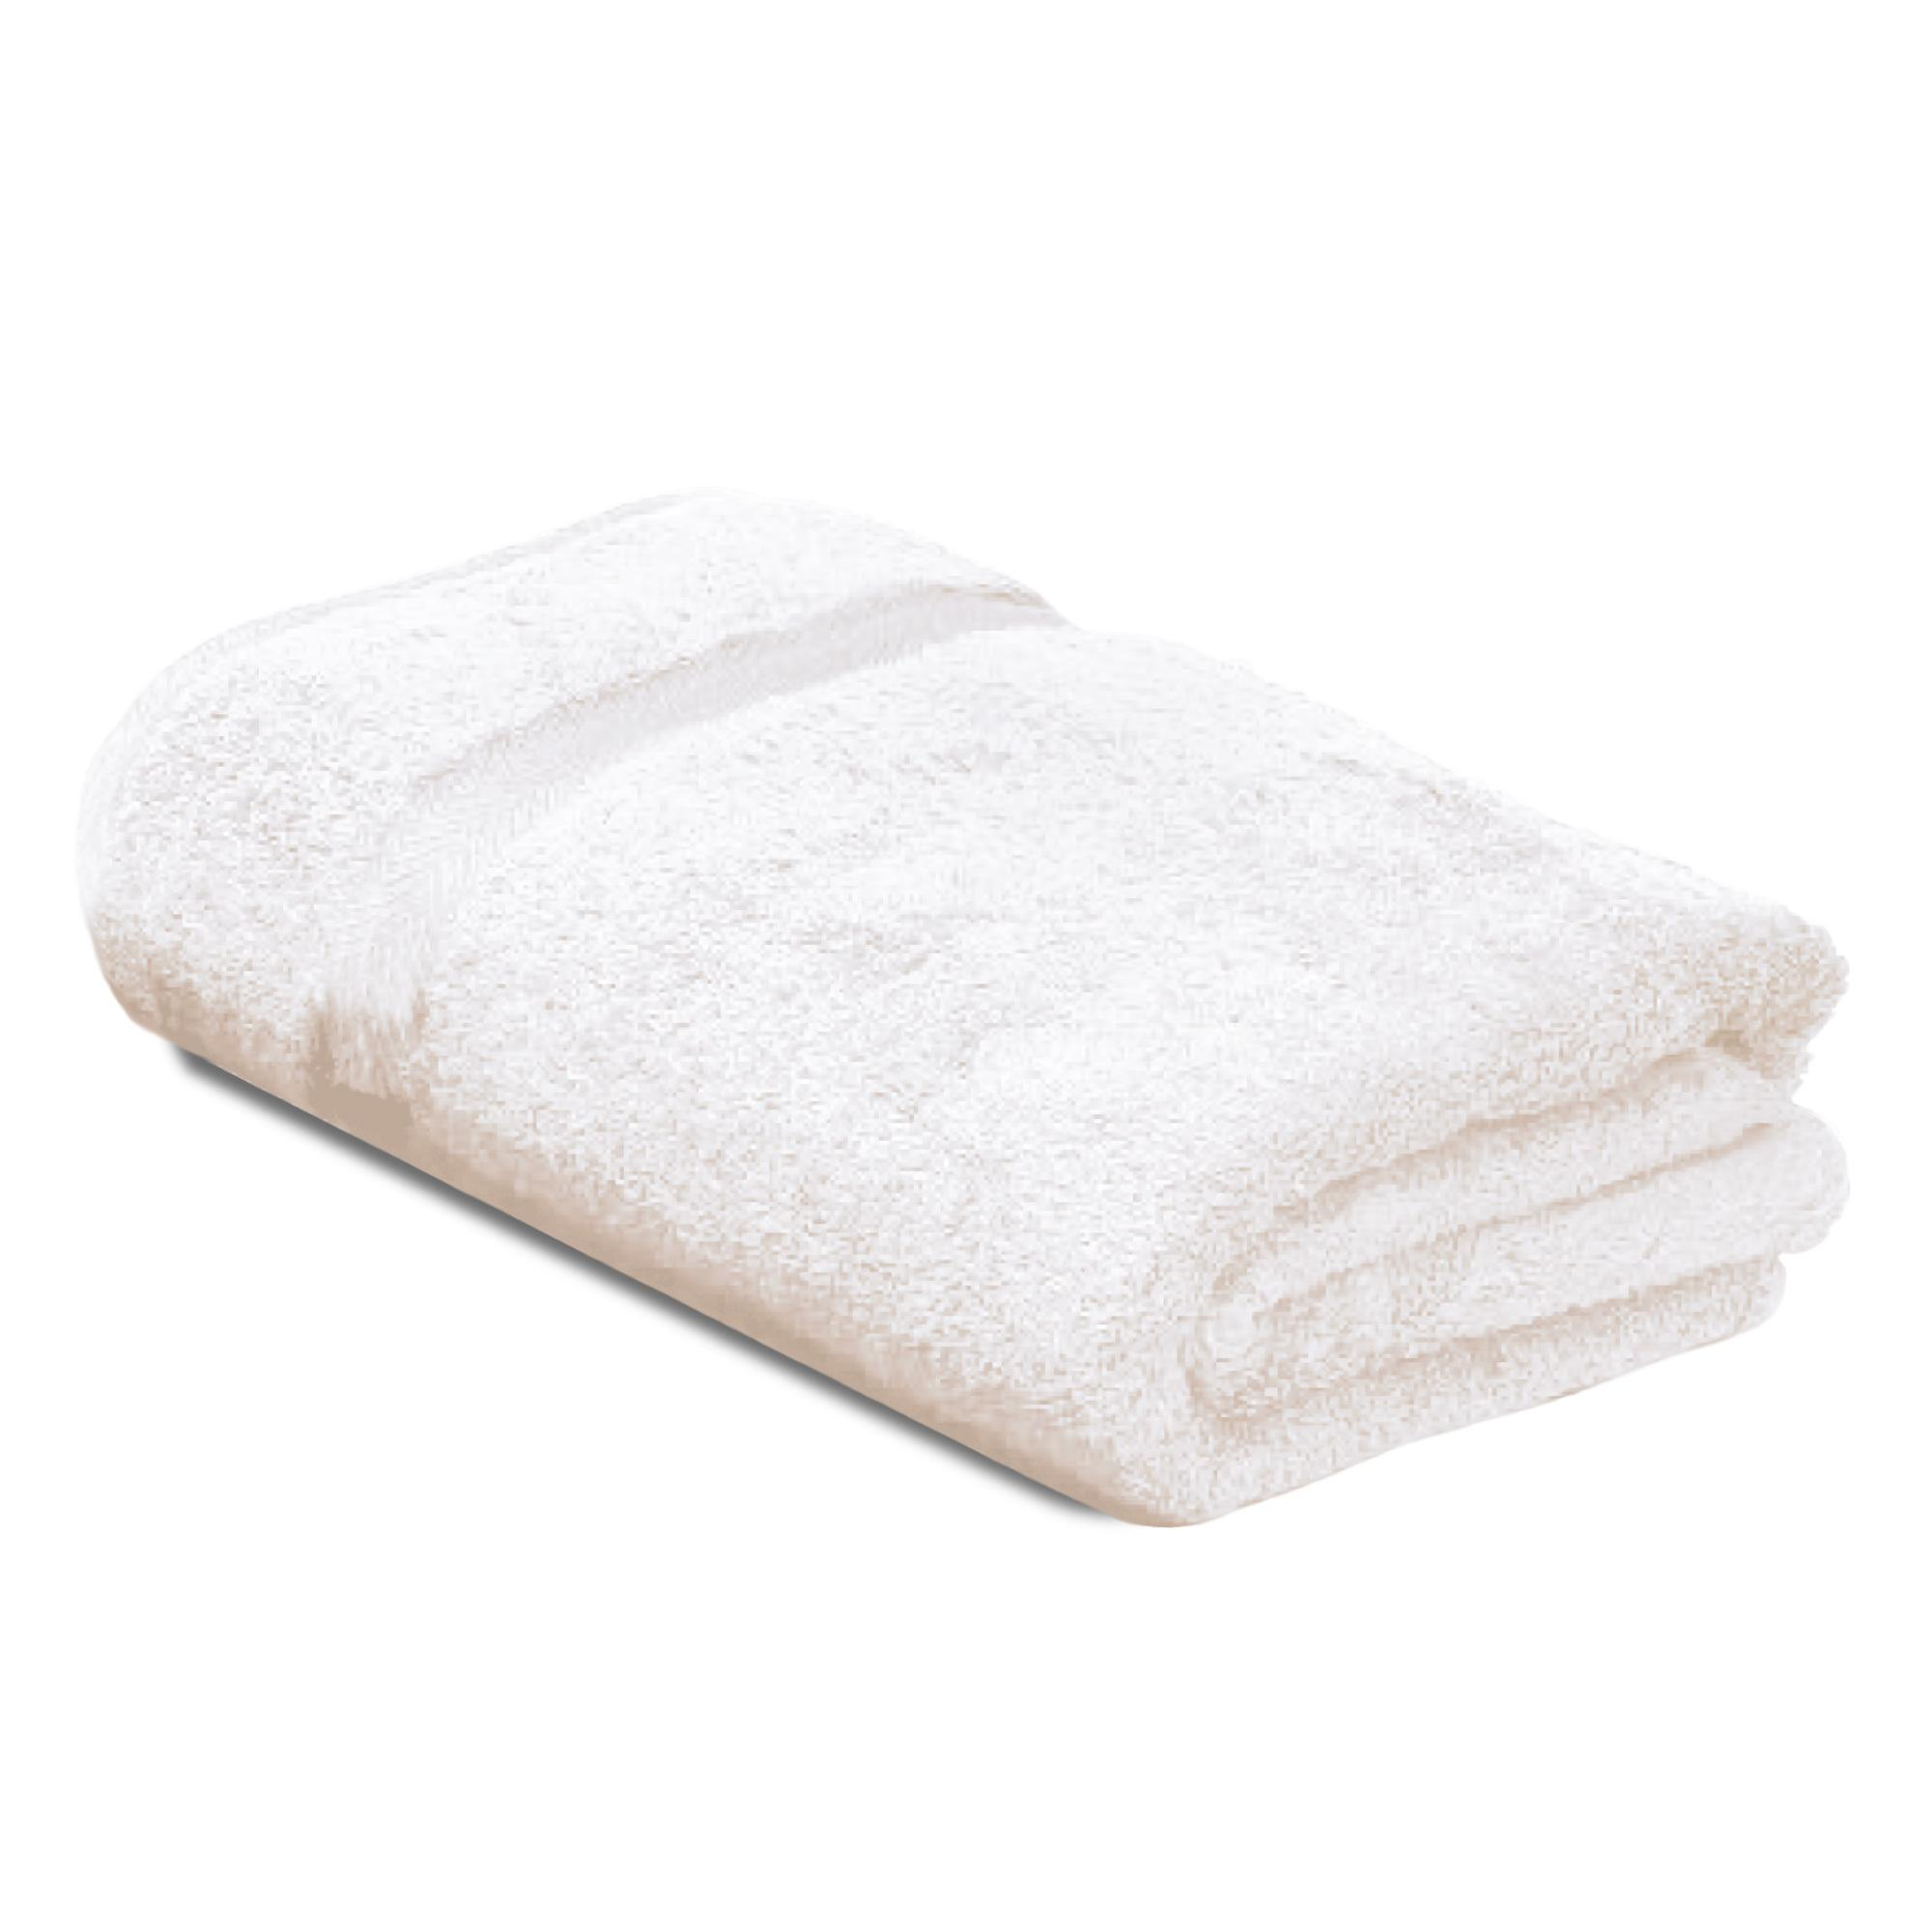 drap de bain 100x150 coton uni royal cresent blanc. Black Bedroom Furniture Sets. Home Design Ideas